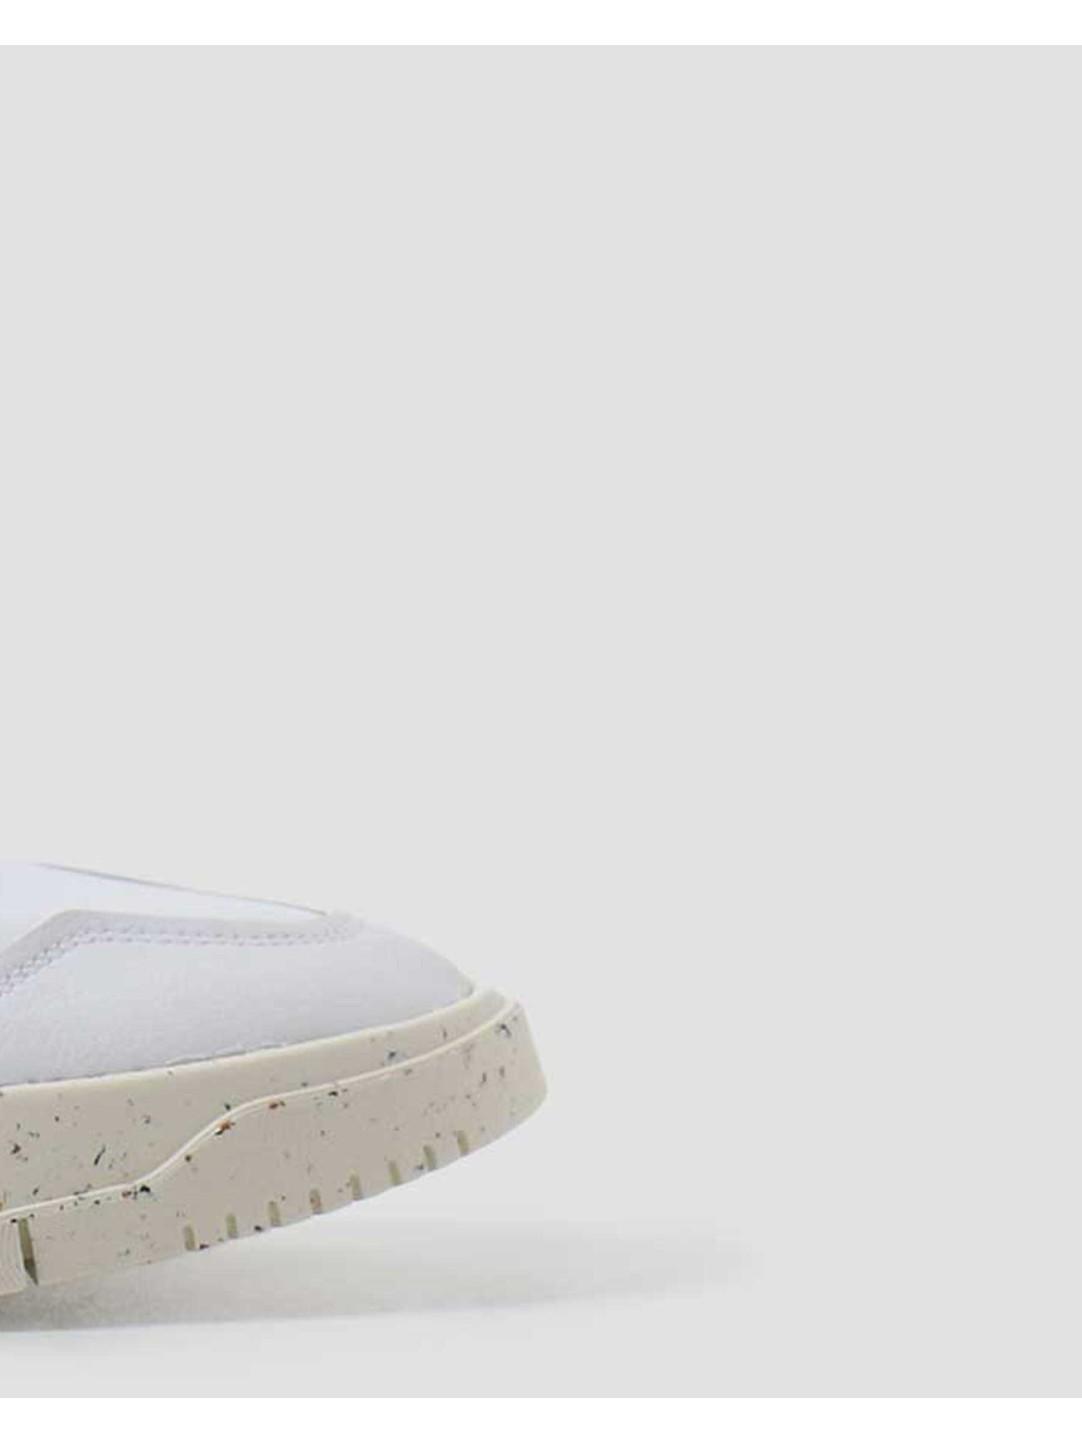 adidas adidas U Sc Premiere Footwear White Off-White Green FW2361